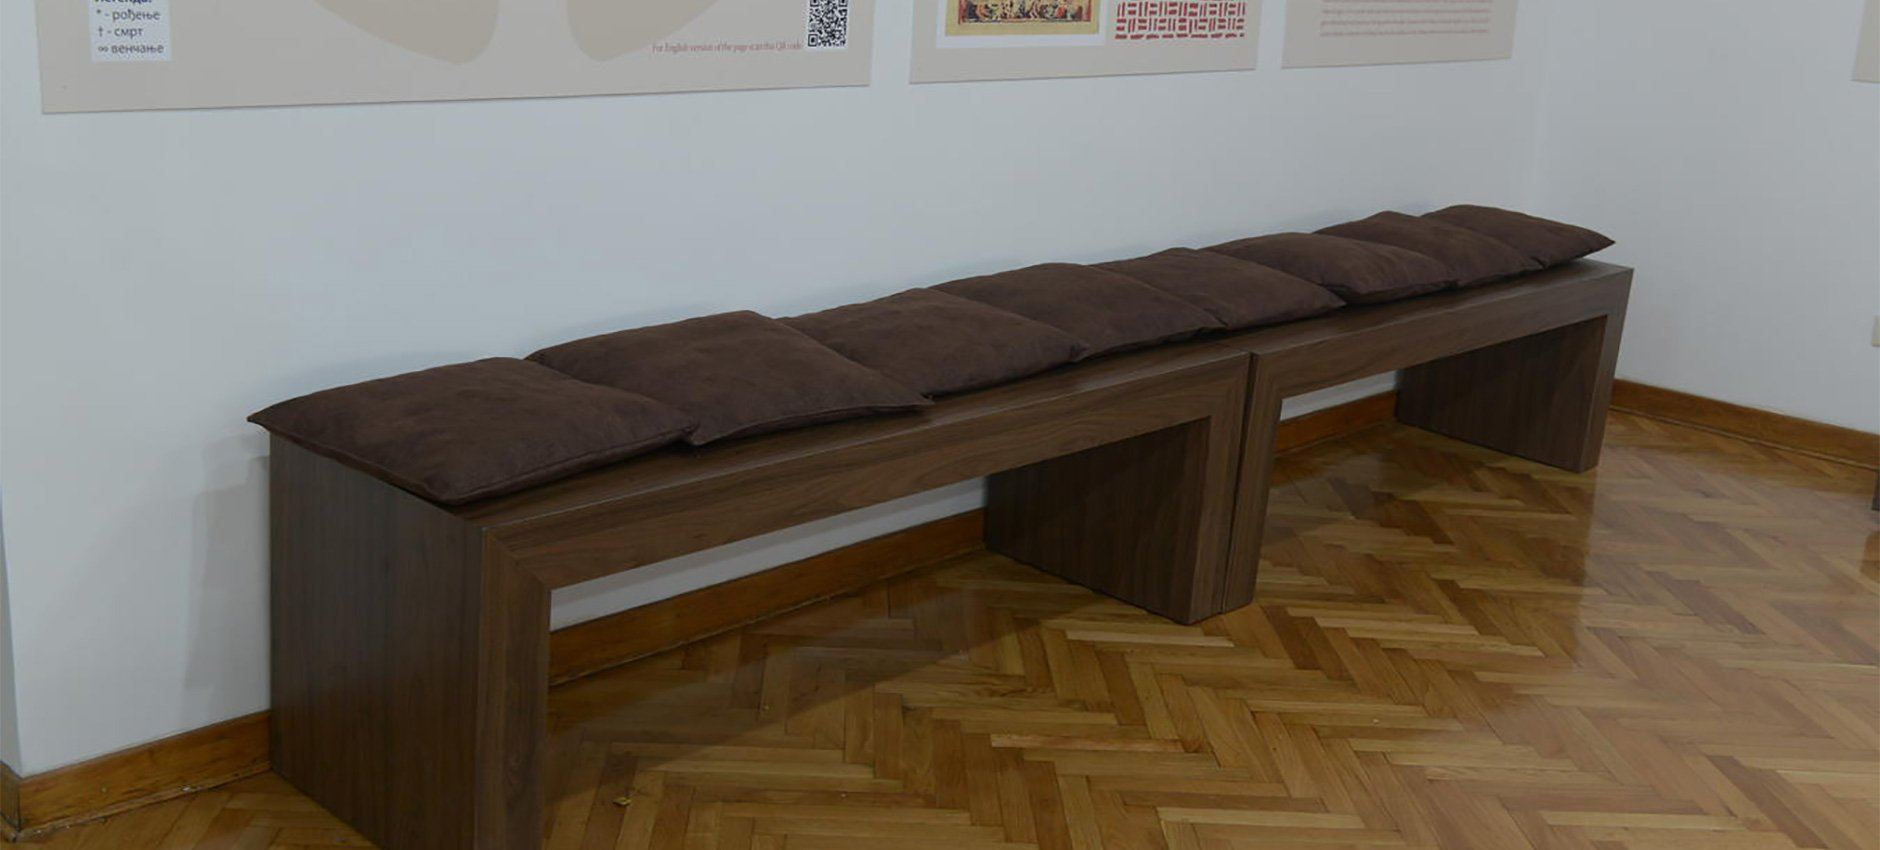 smederevo-muzej-14.jpg